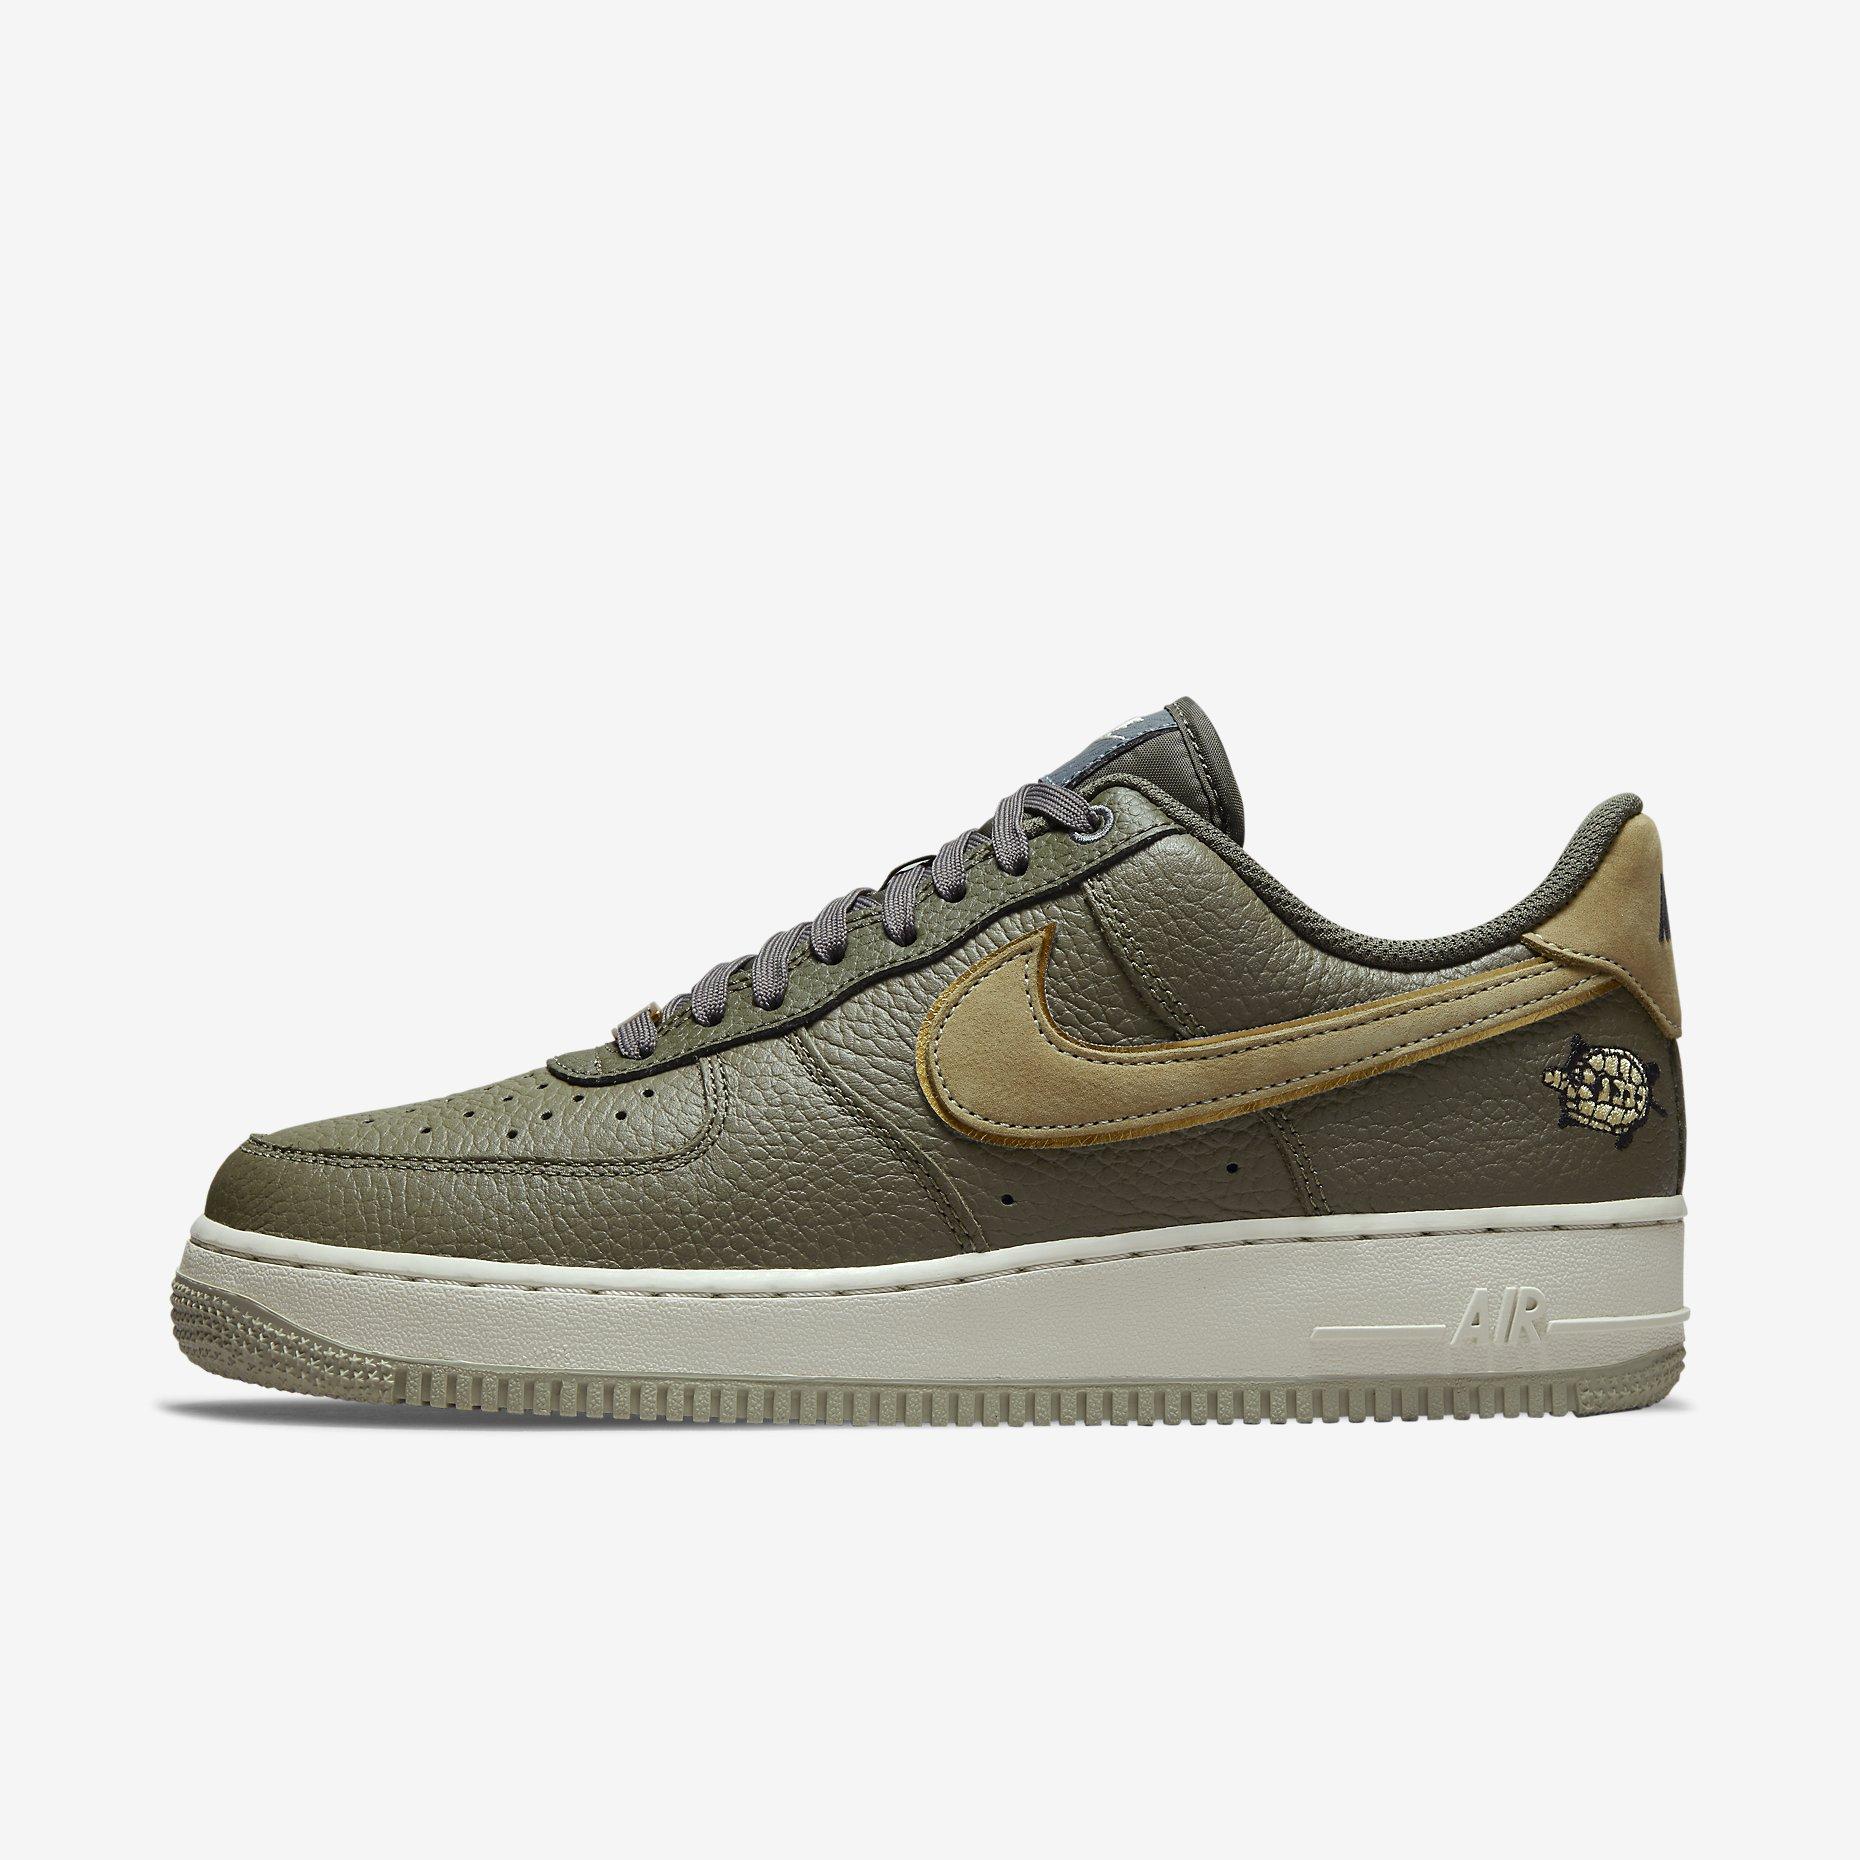 Nike Air Force 1 '07 LX 'Turtle'